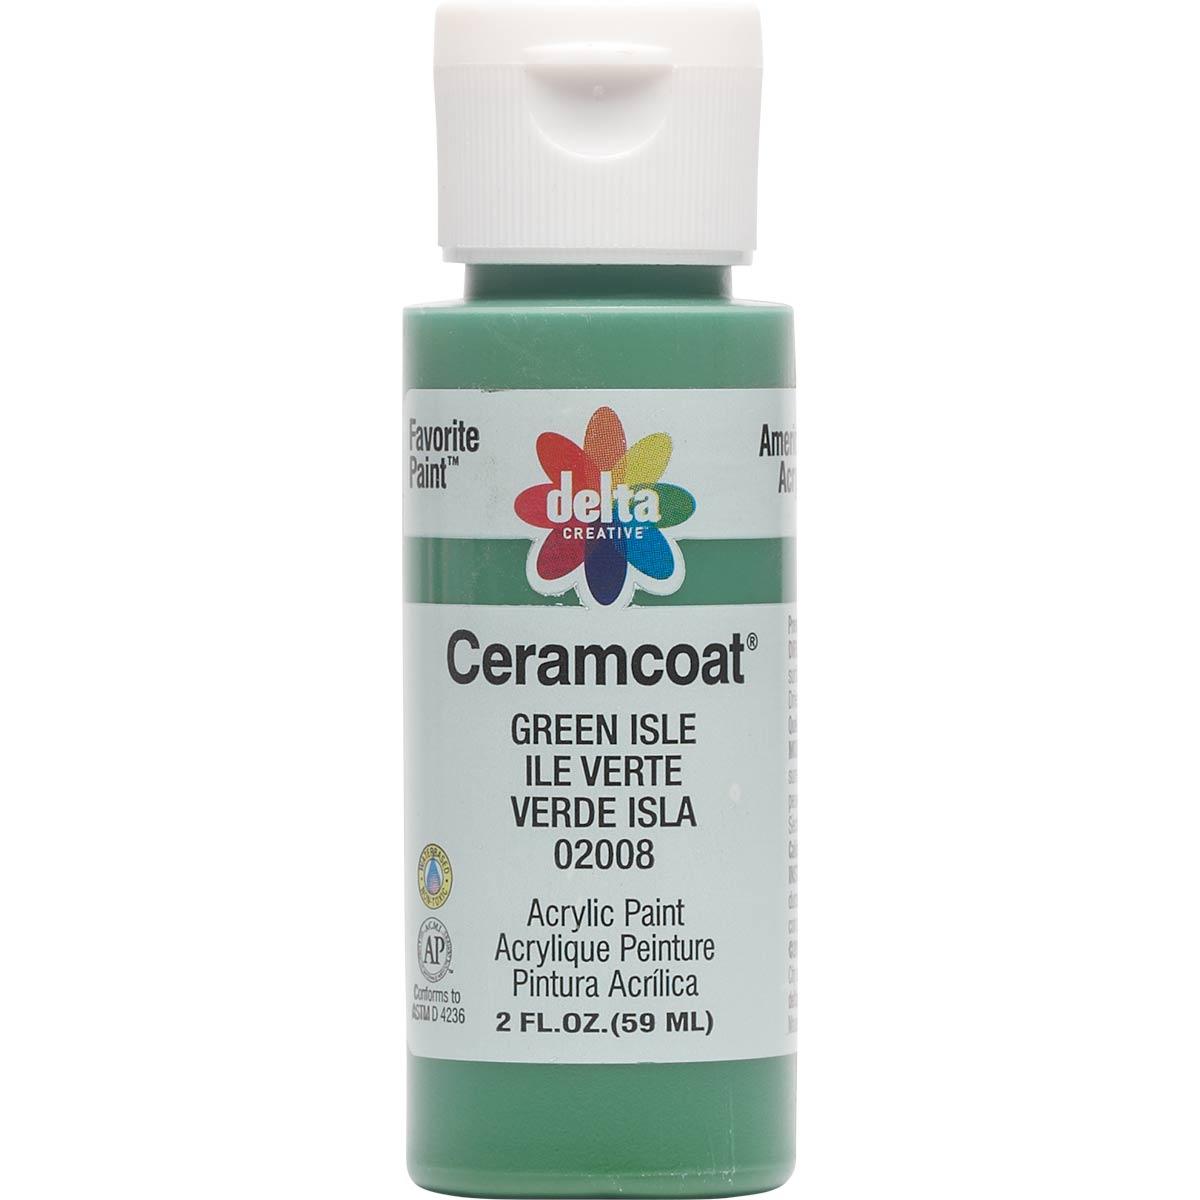 Delta Ceramcoat ® Acrylic Paint - Green Isle, 2 oz.